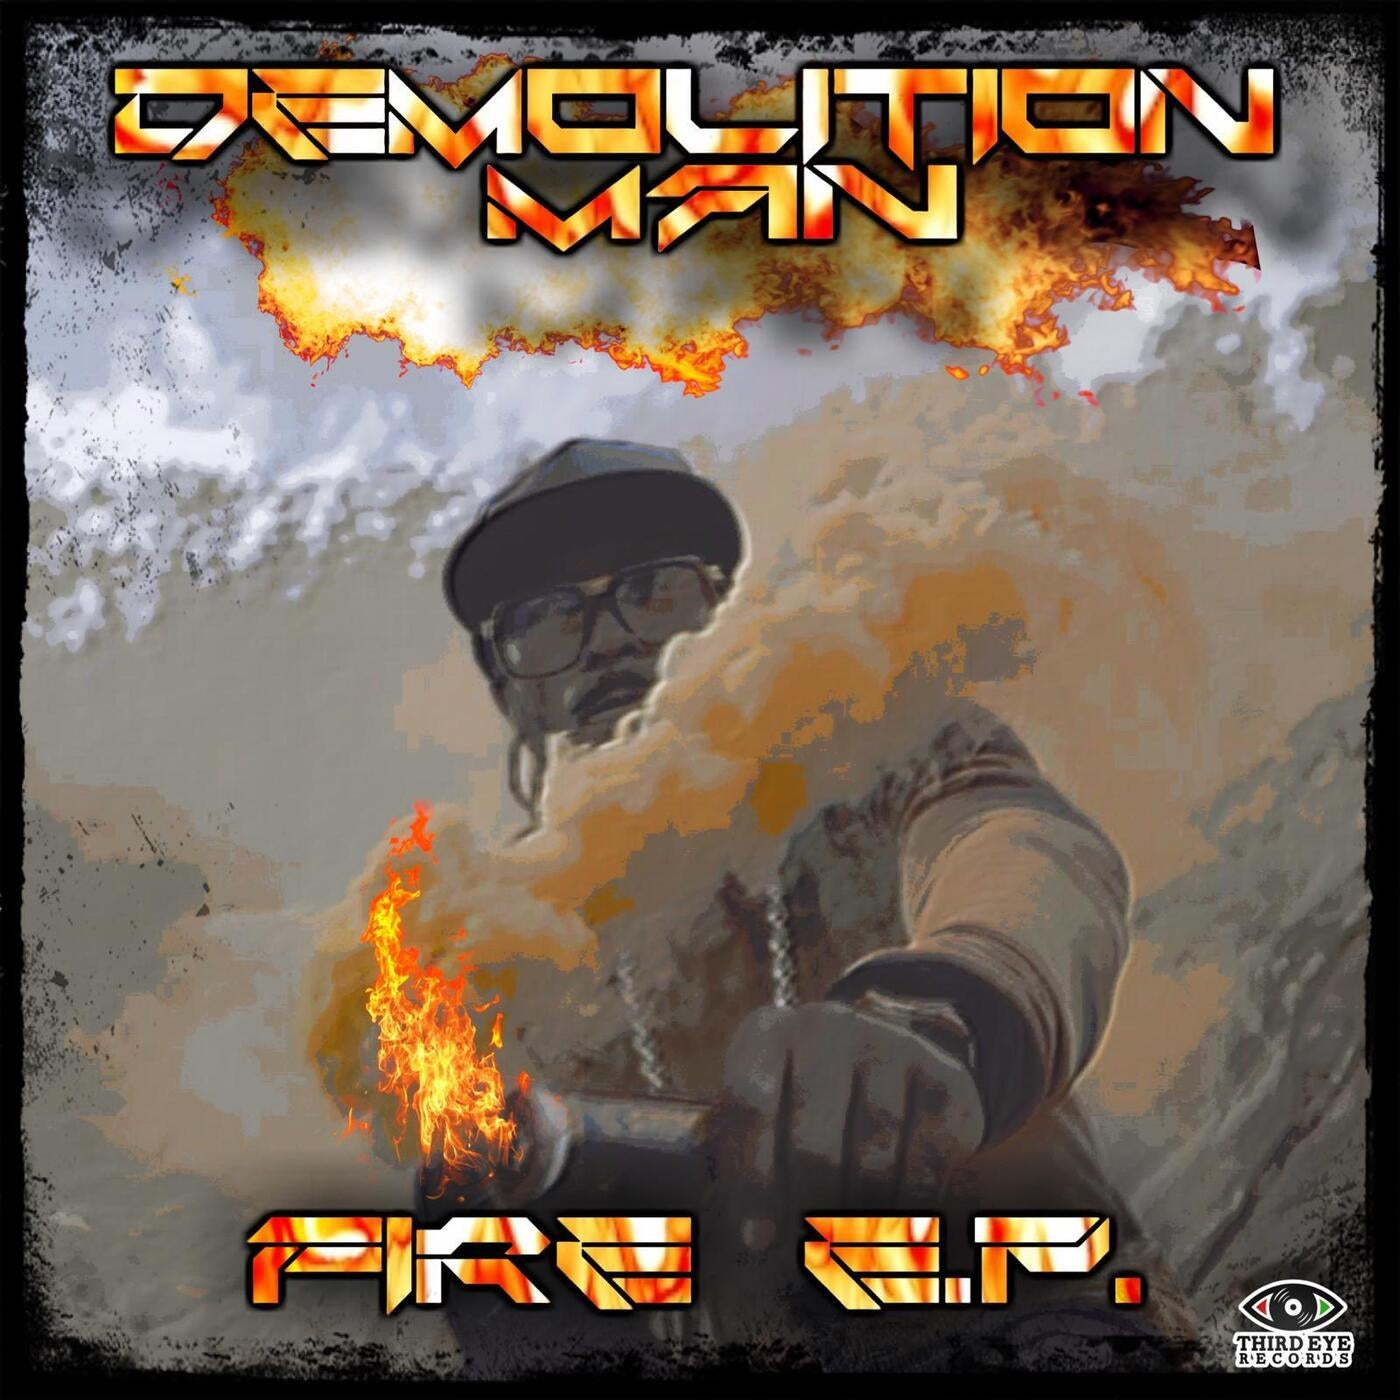 Fire feat. Cutty Ranks feat. Inja (Innamiyardproductions Mix)